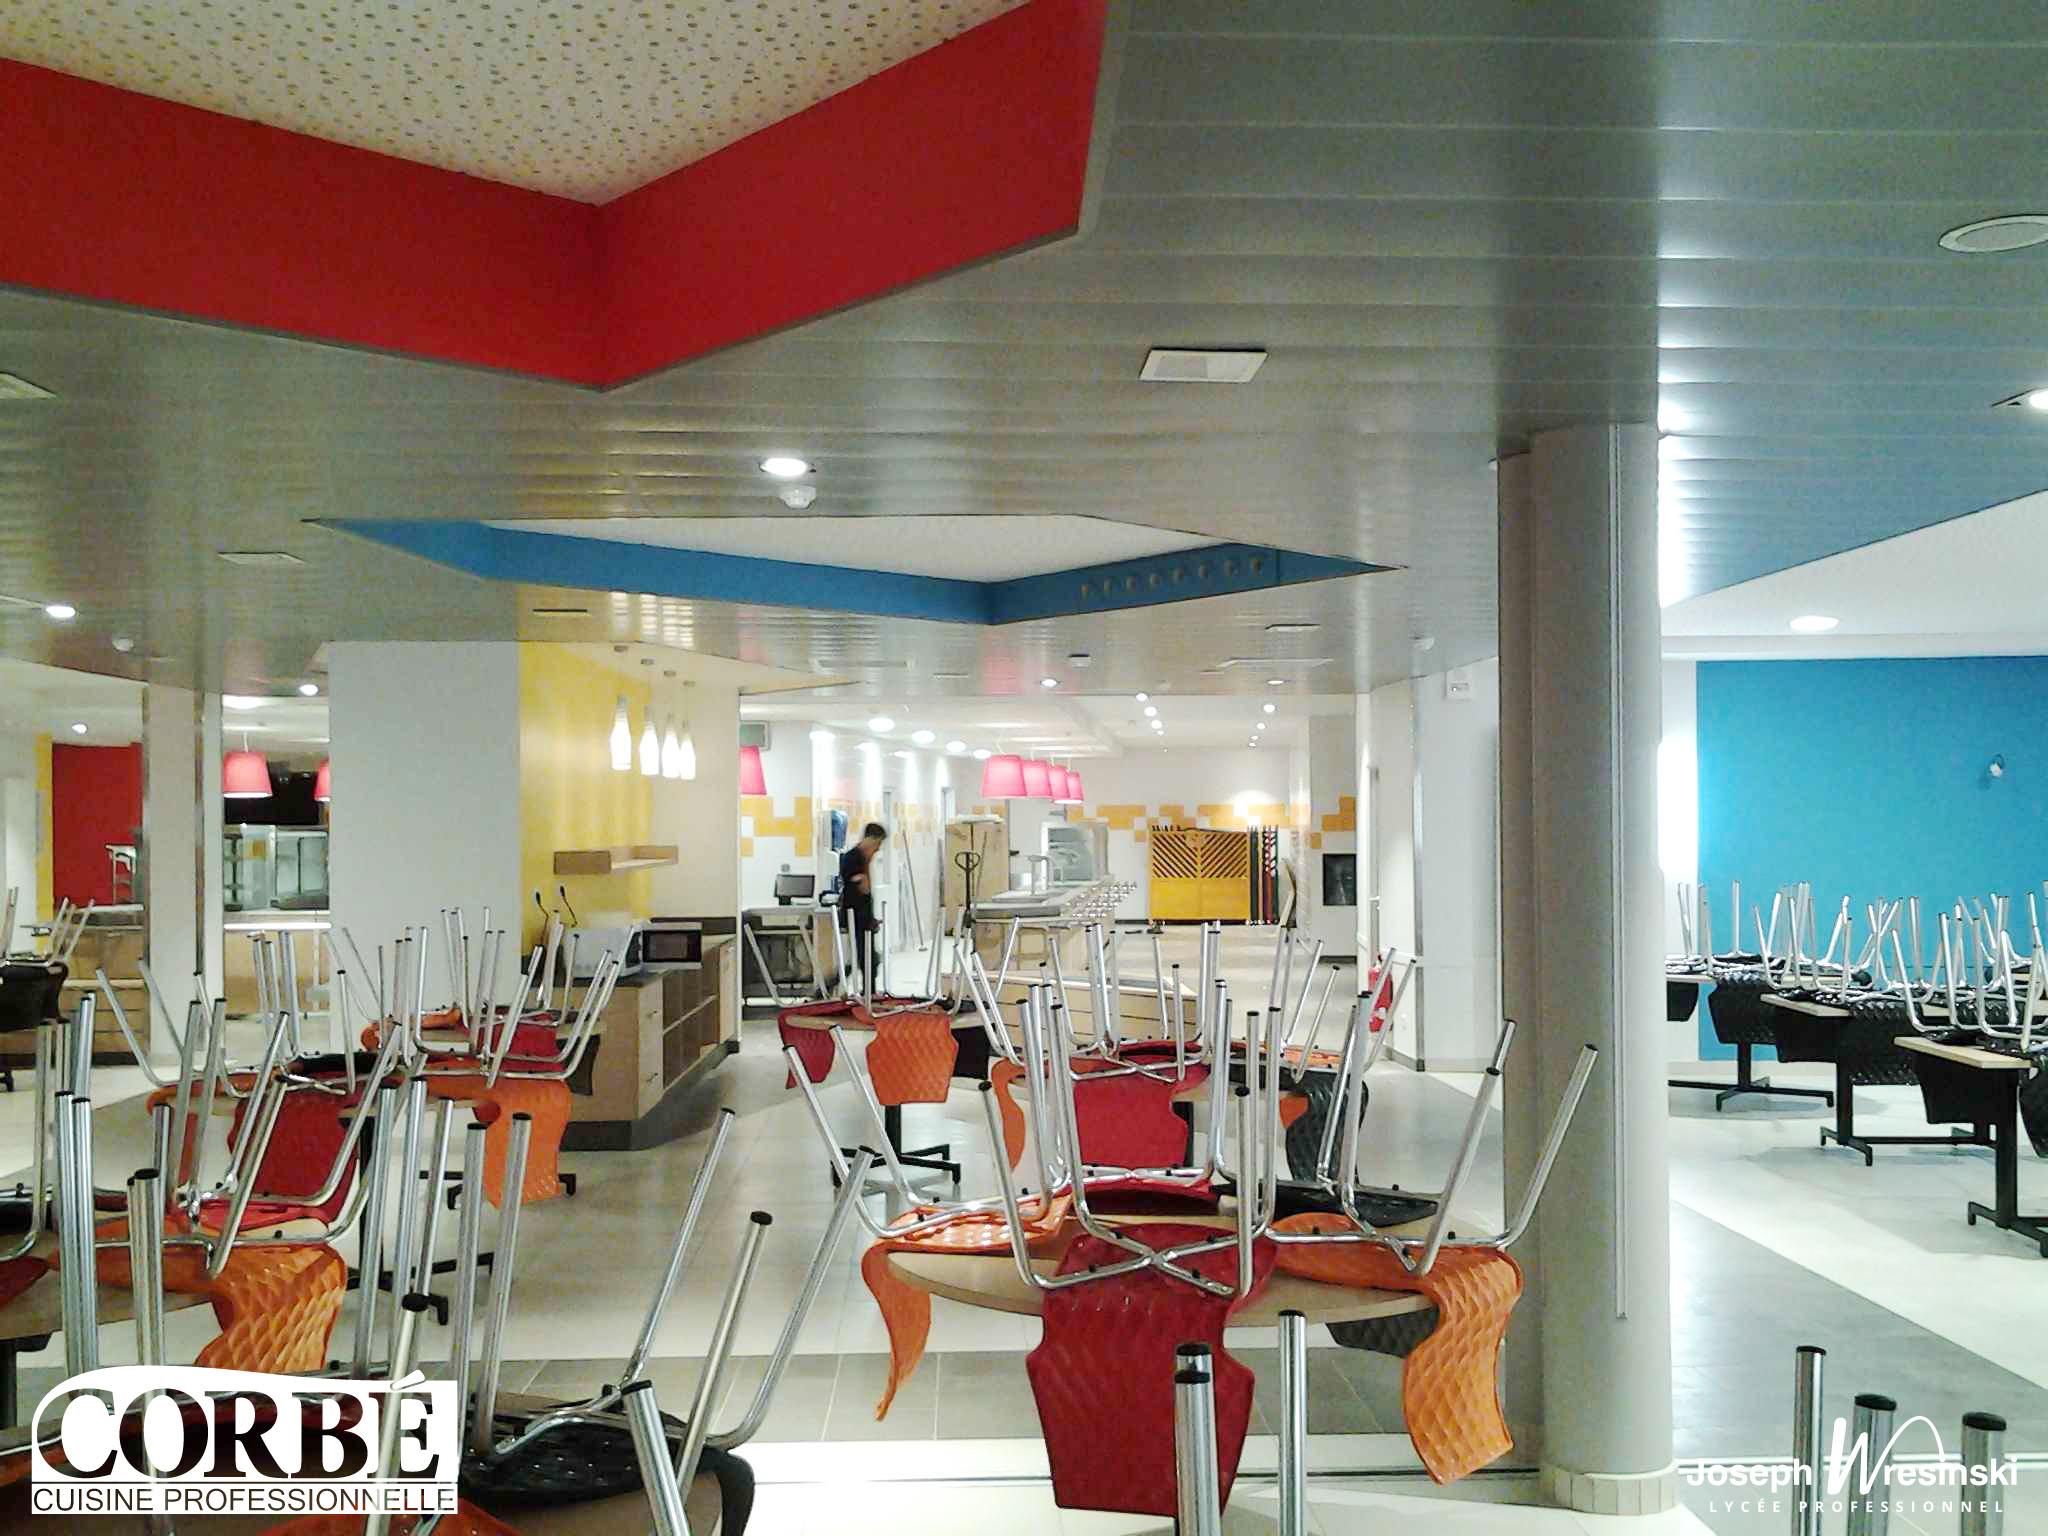 Restaurant-Scolaire-Wresinski-Corbé-Cuisine-Professionnelle3